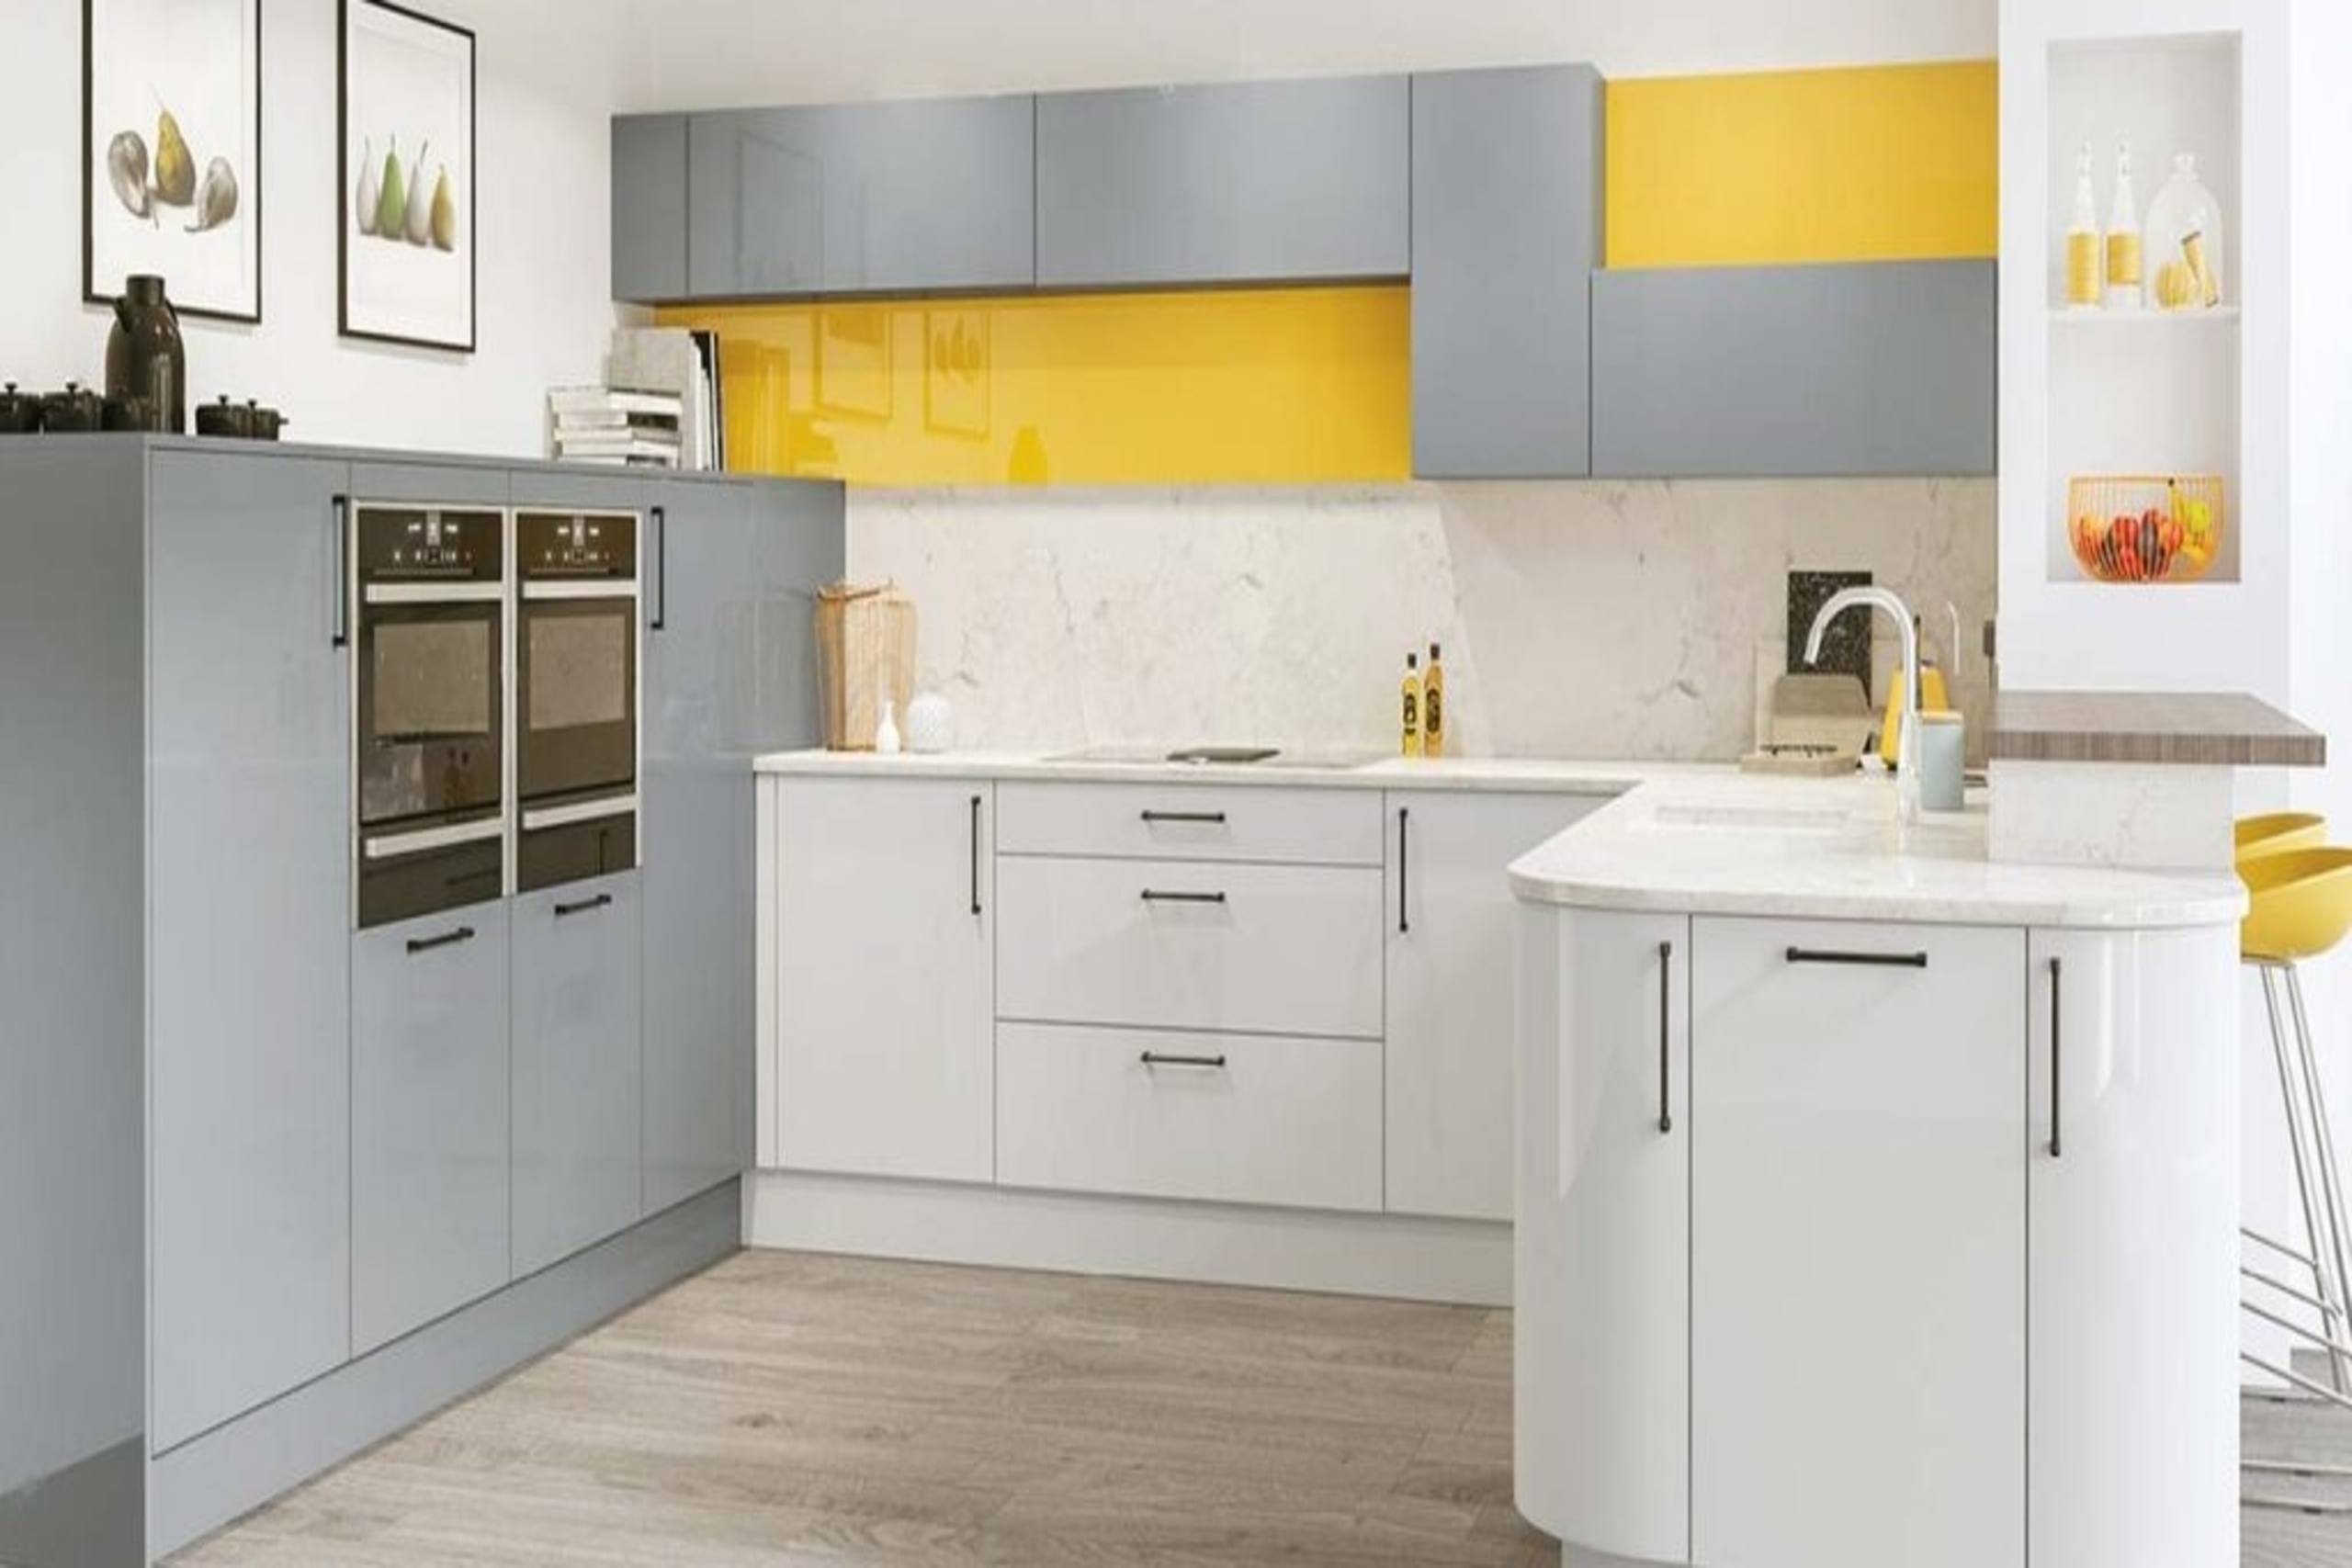 DKB metallic blue kitchen